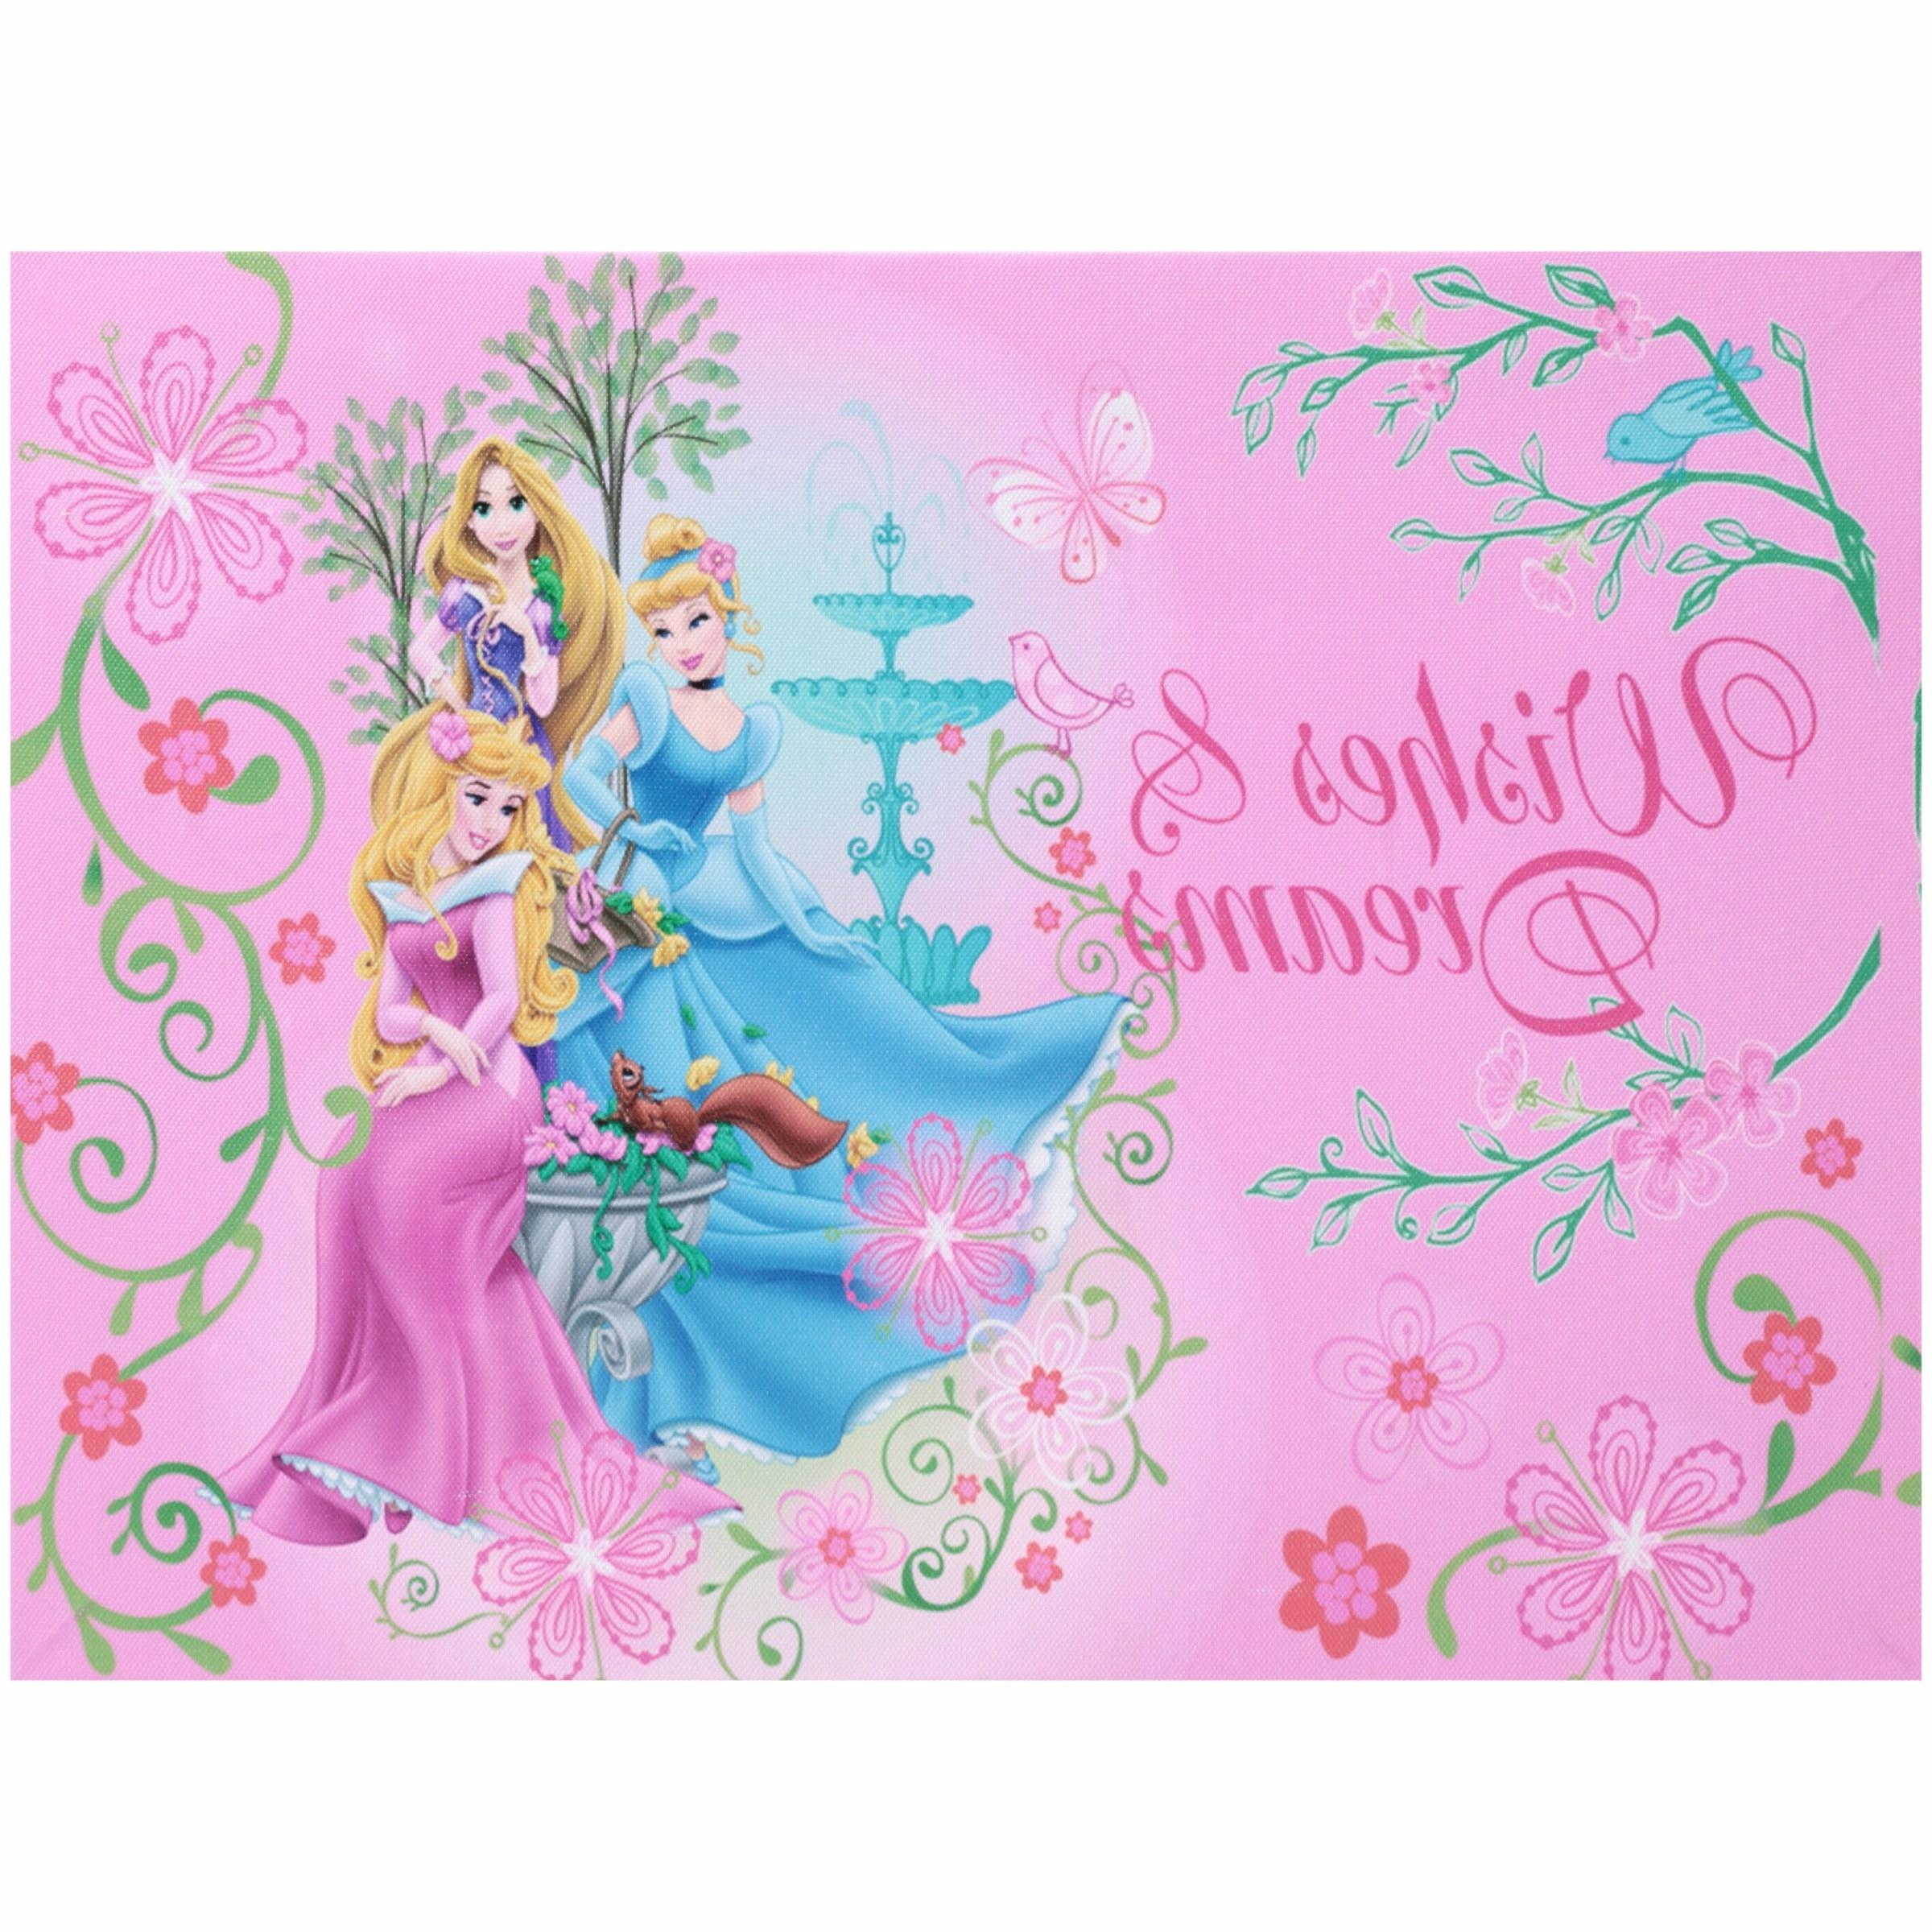 Most Popular Disney Princess Led Light Up Canvas Wall Art – Walmart For Princess Canvas Wall Art (View 6 of 15)